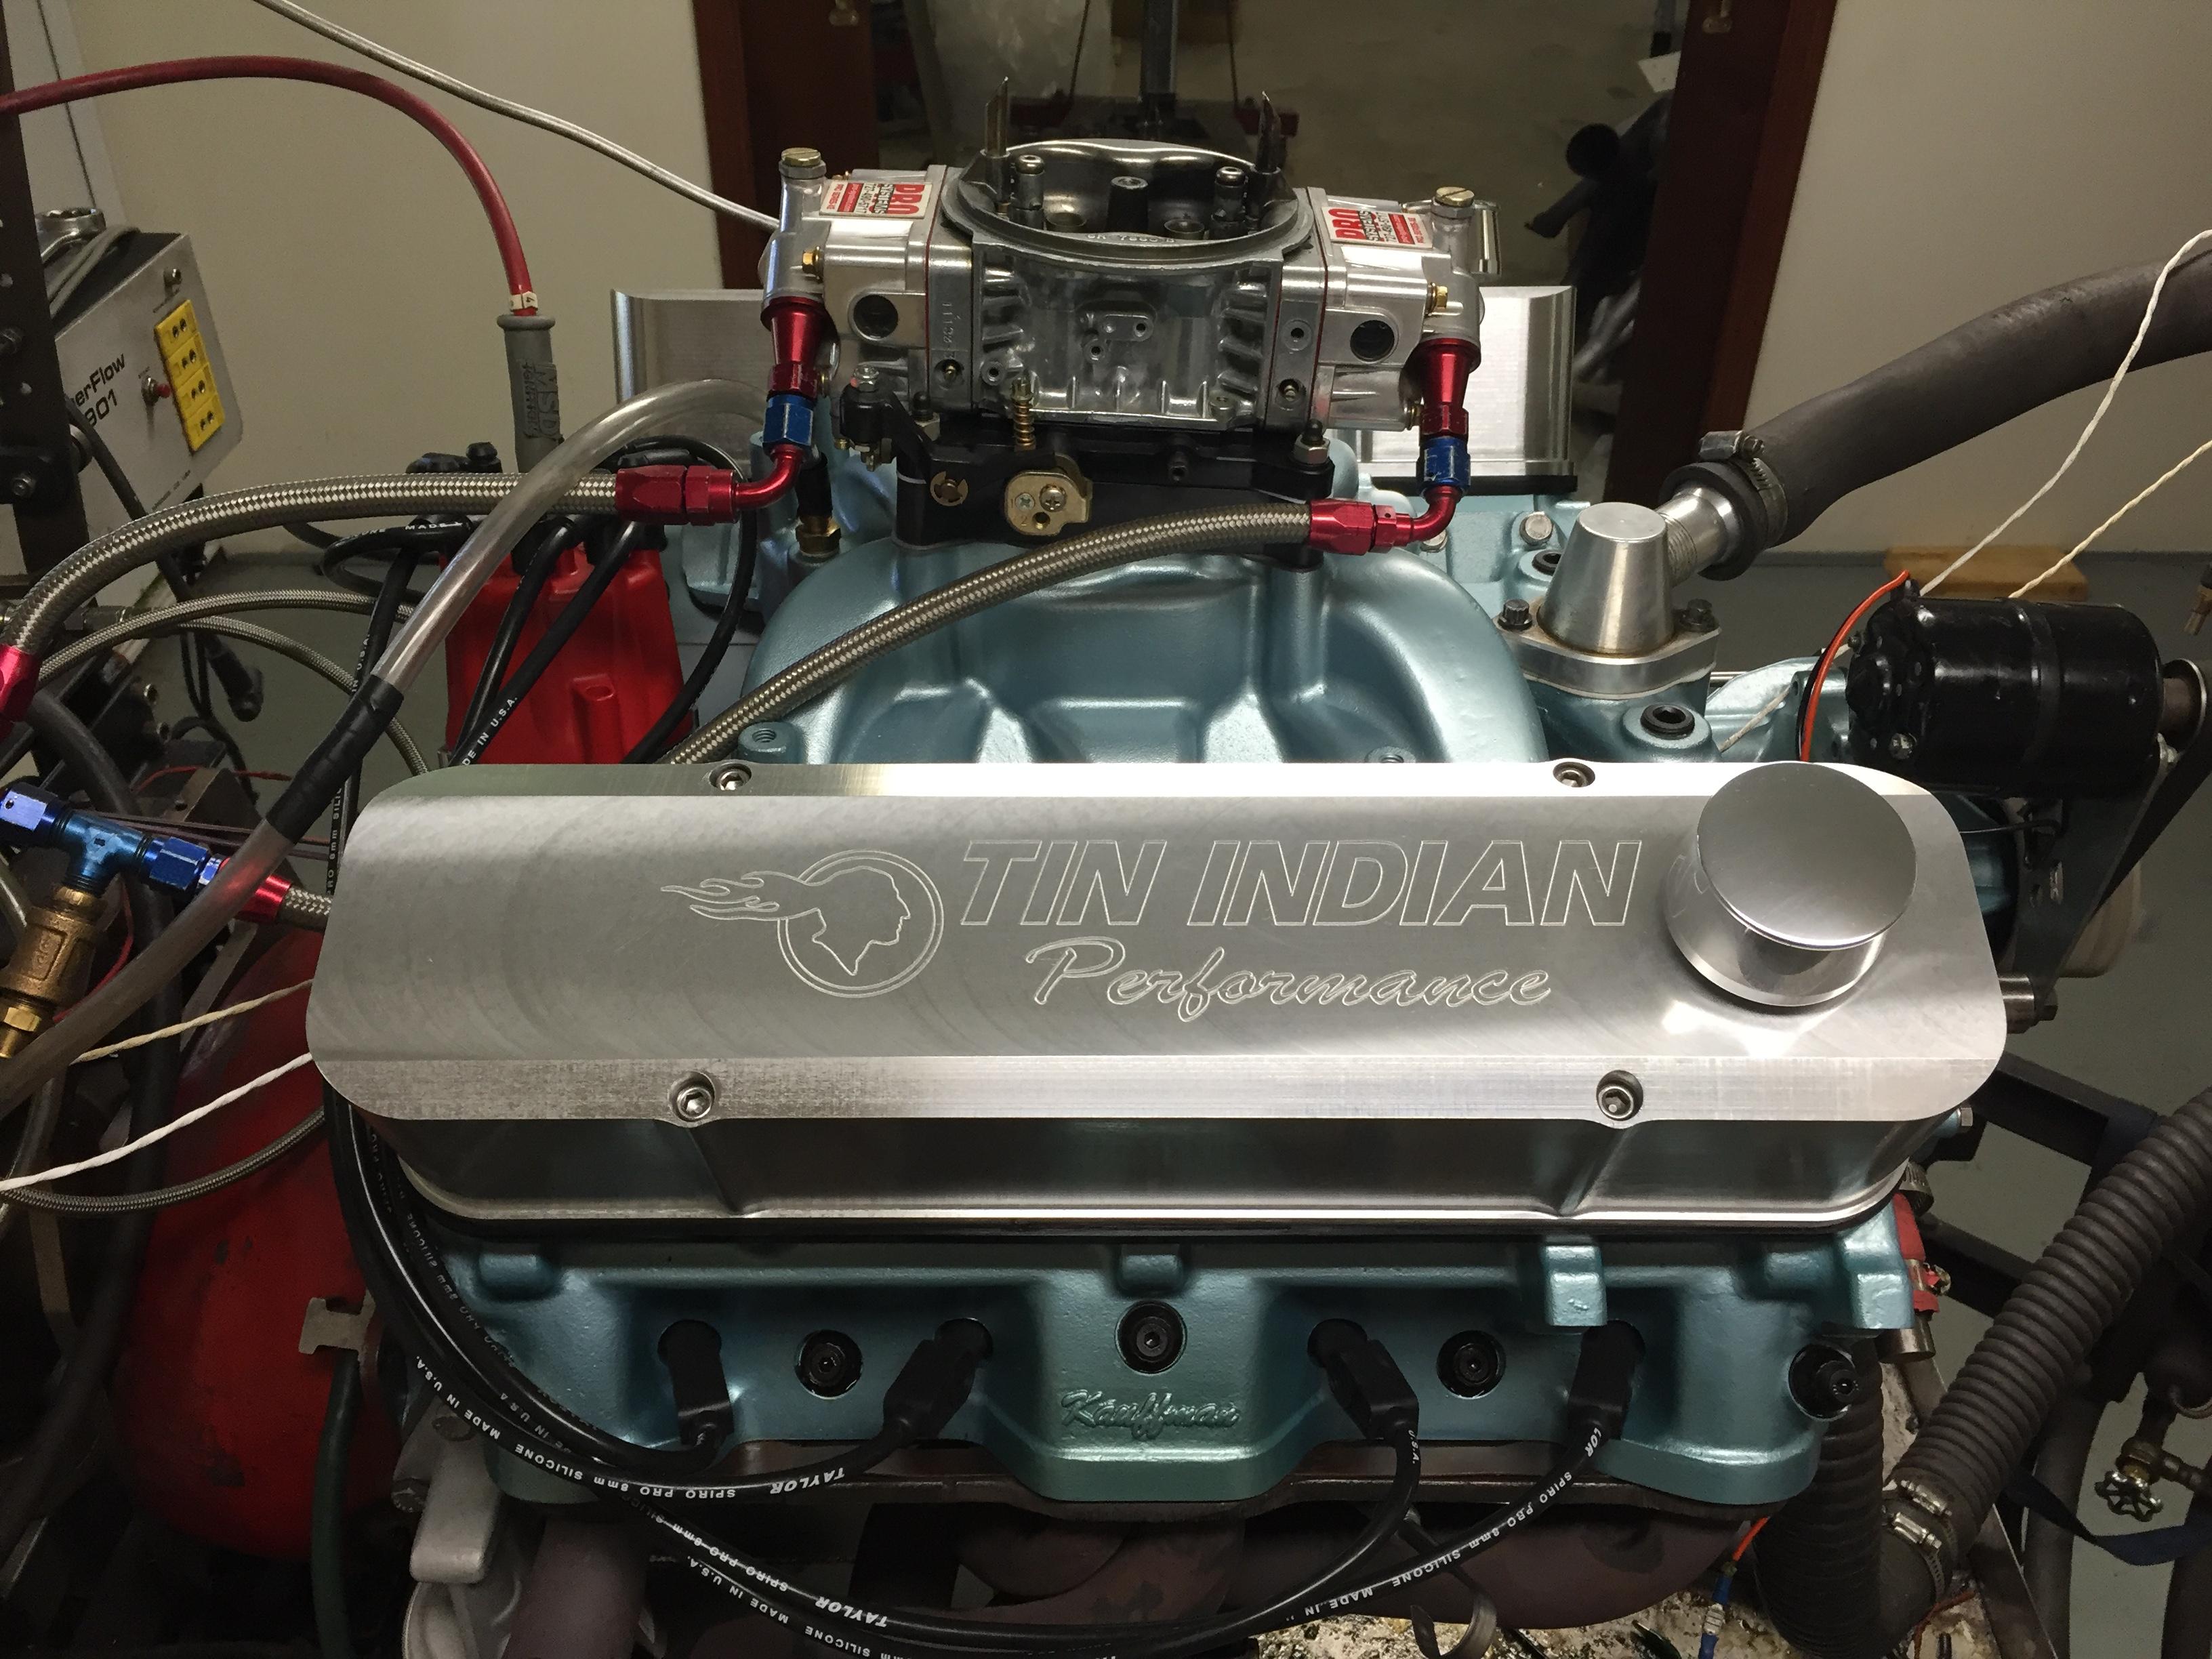 jeff-tuente-463-cid-533-horse-582-ft-lbs-pontiac-engine-4